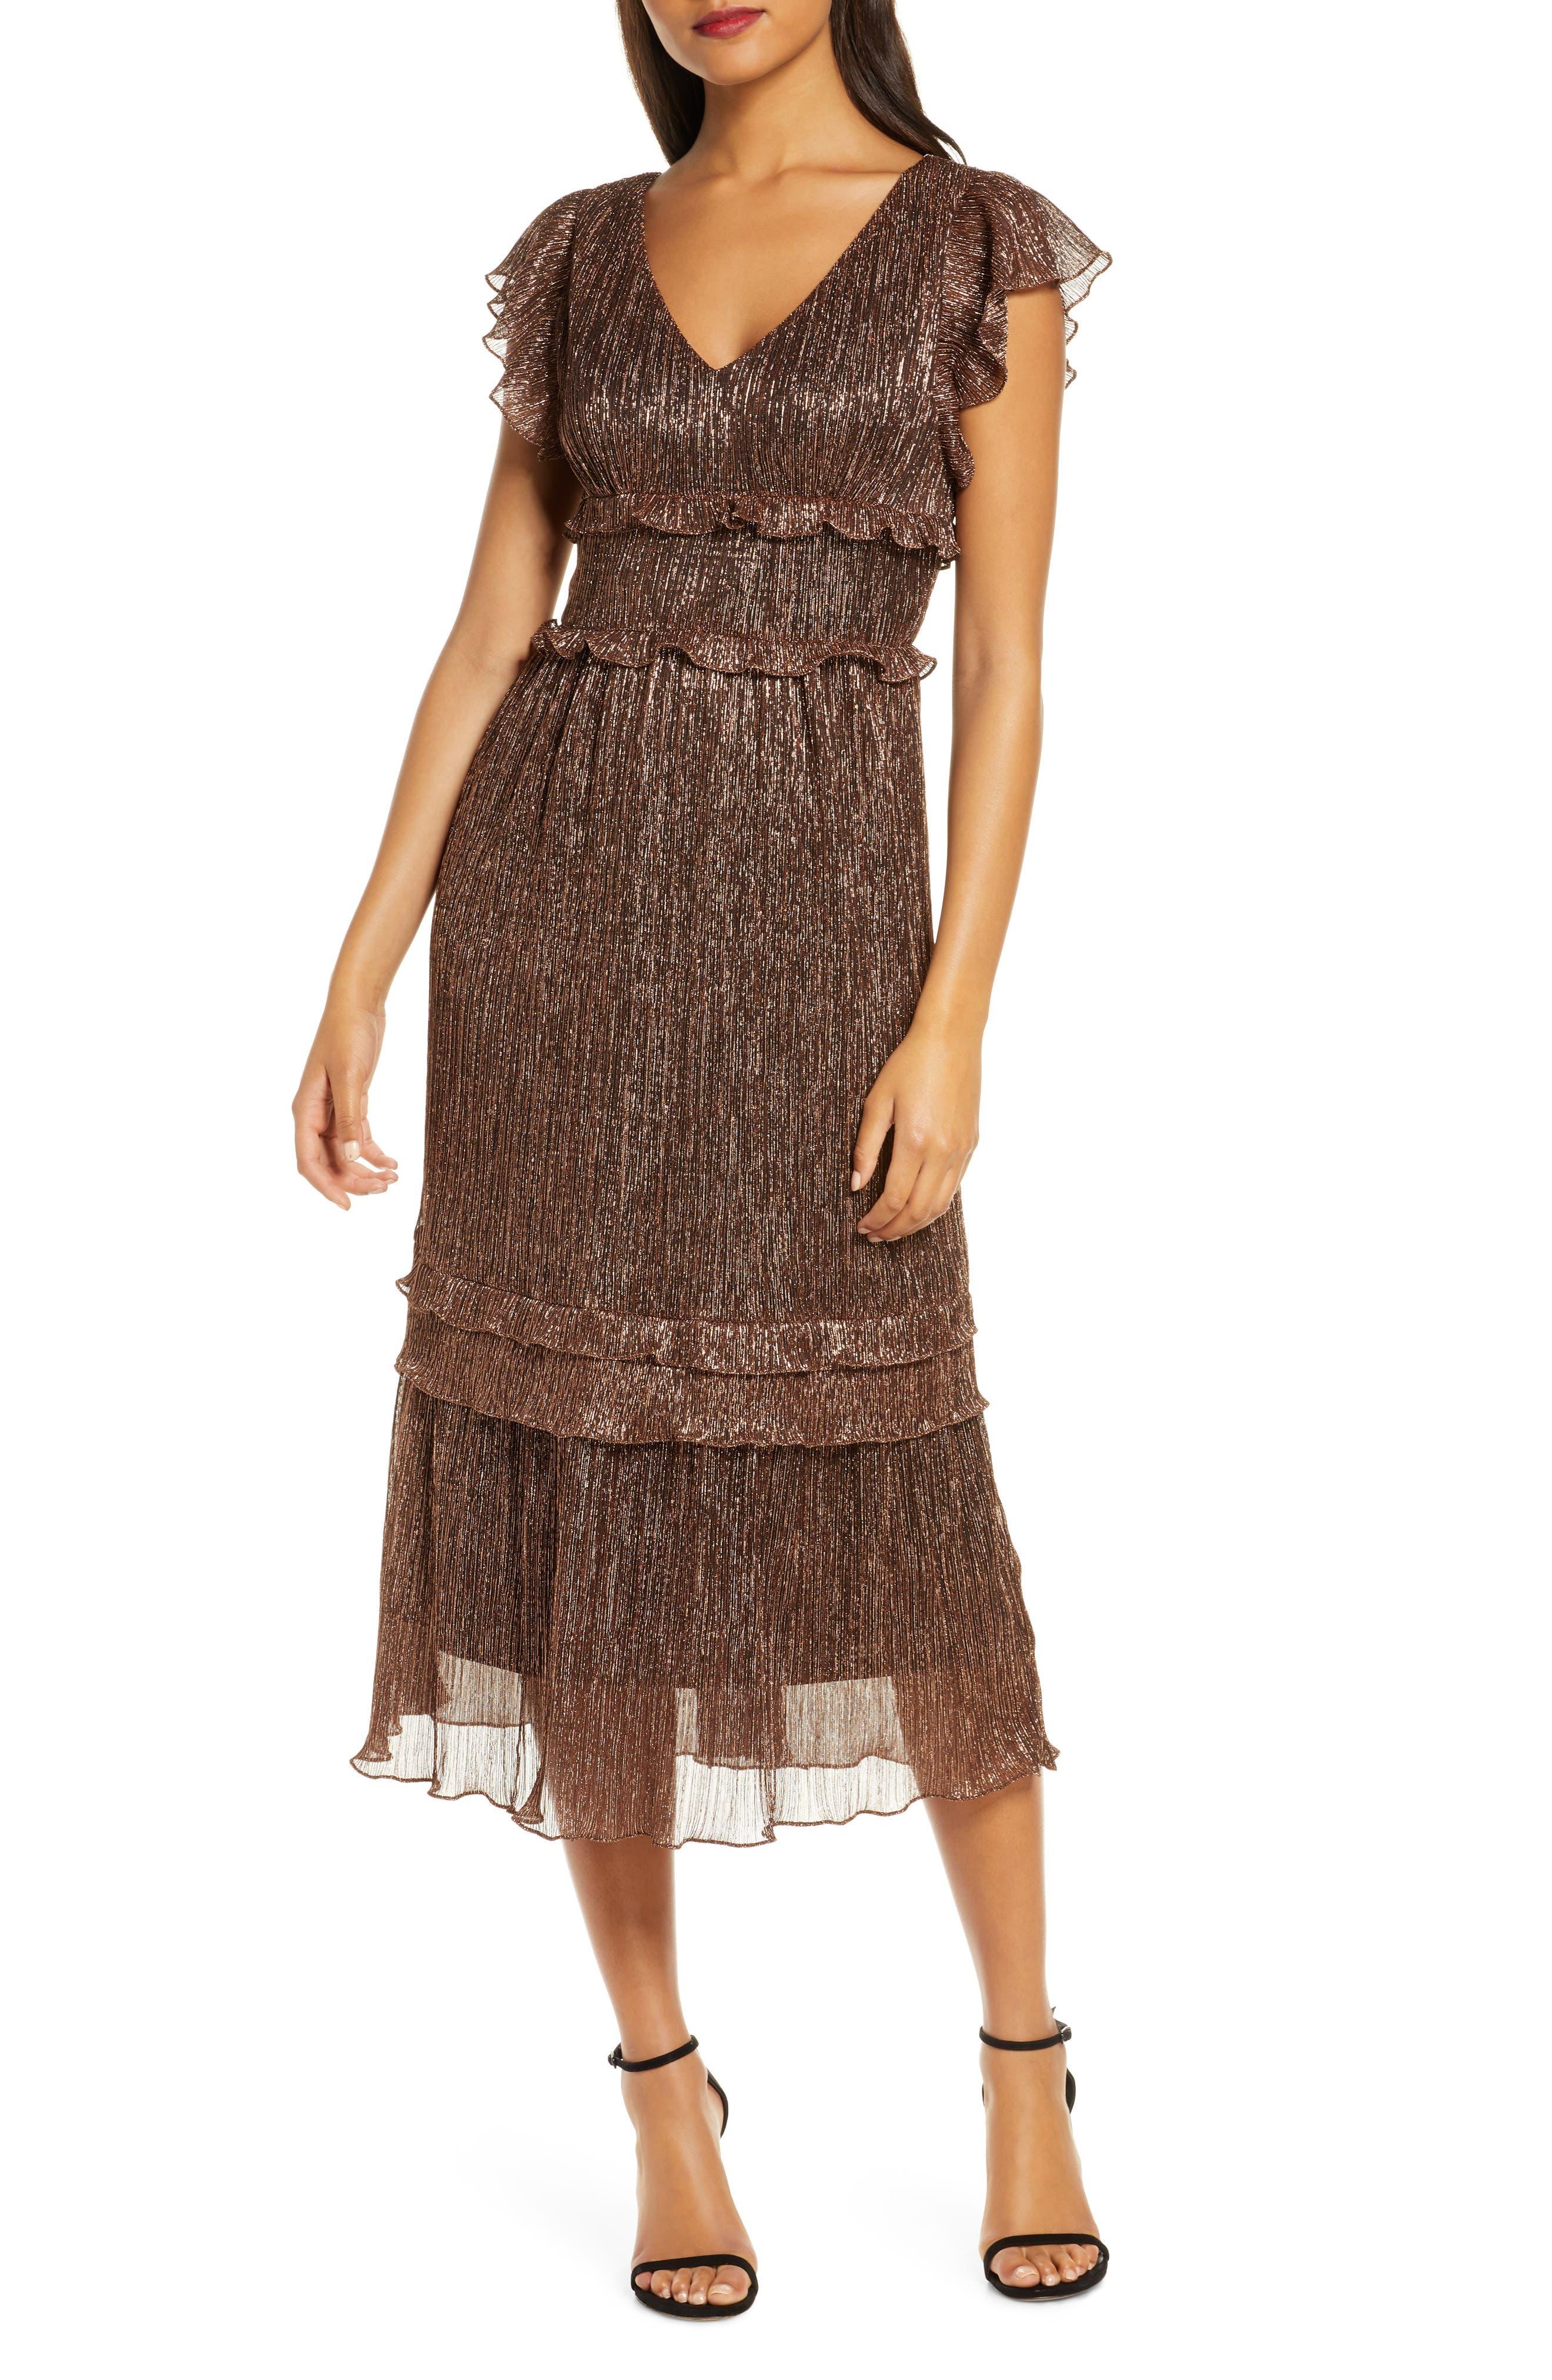 Vintage 1920s Dresses – Where to Buy Womens Julia Jordan Metallic Ruffle Trim Midi Dress $77.40 AT vintagedancer.com